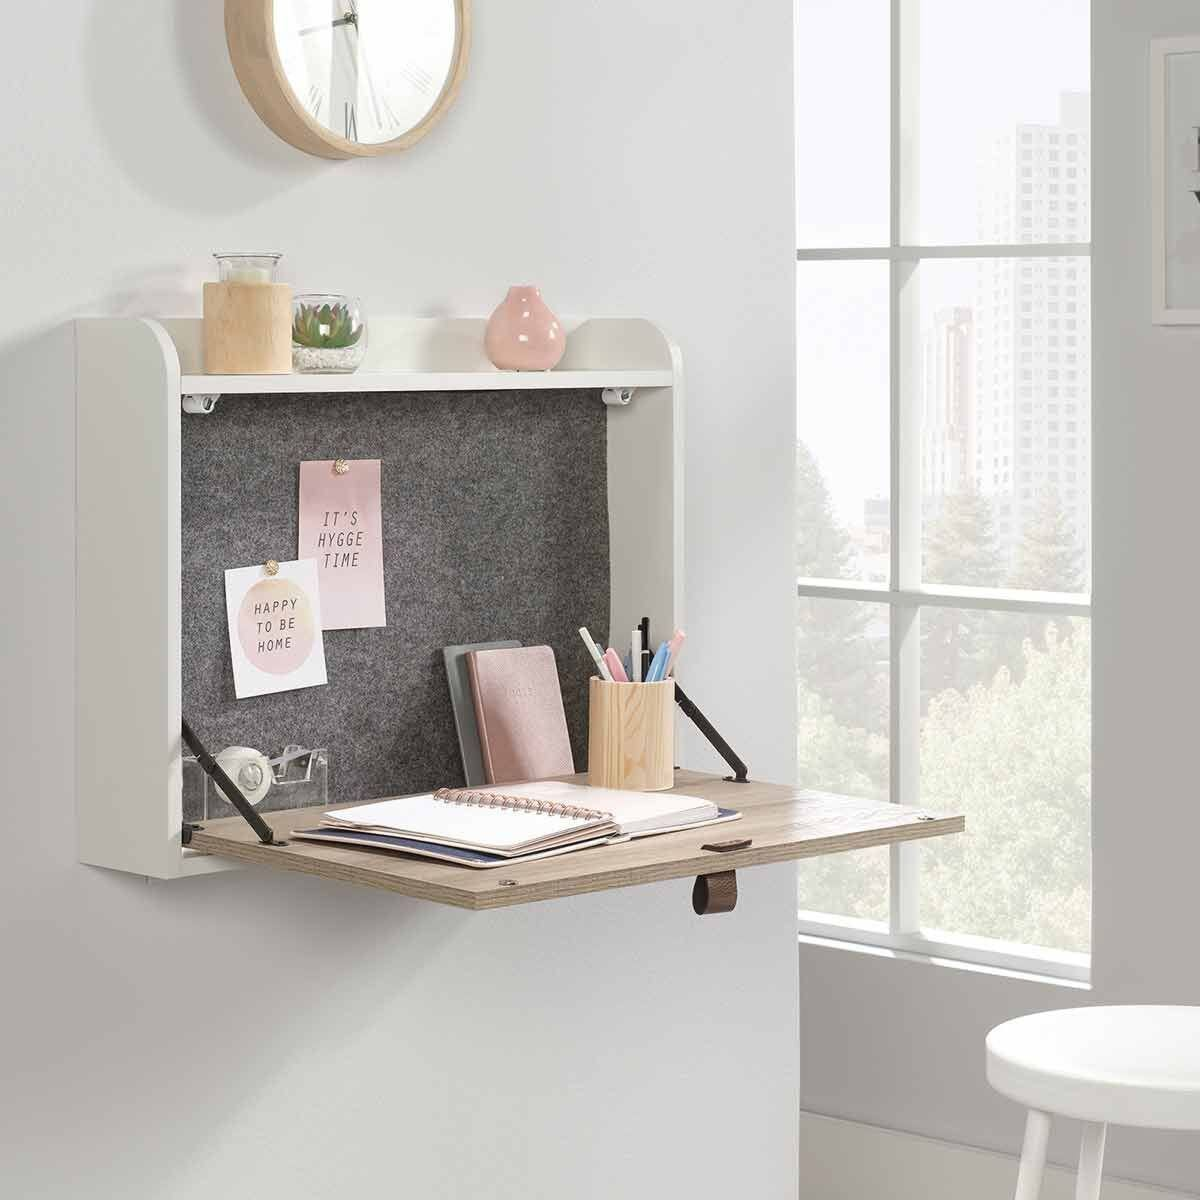 Teknik Avon Leather Handled Wall Desk